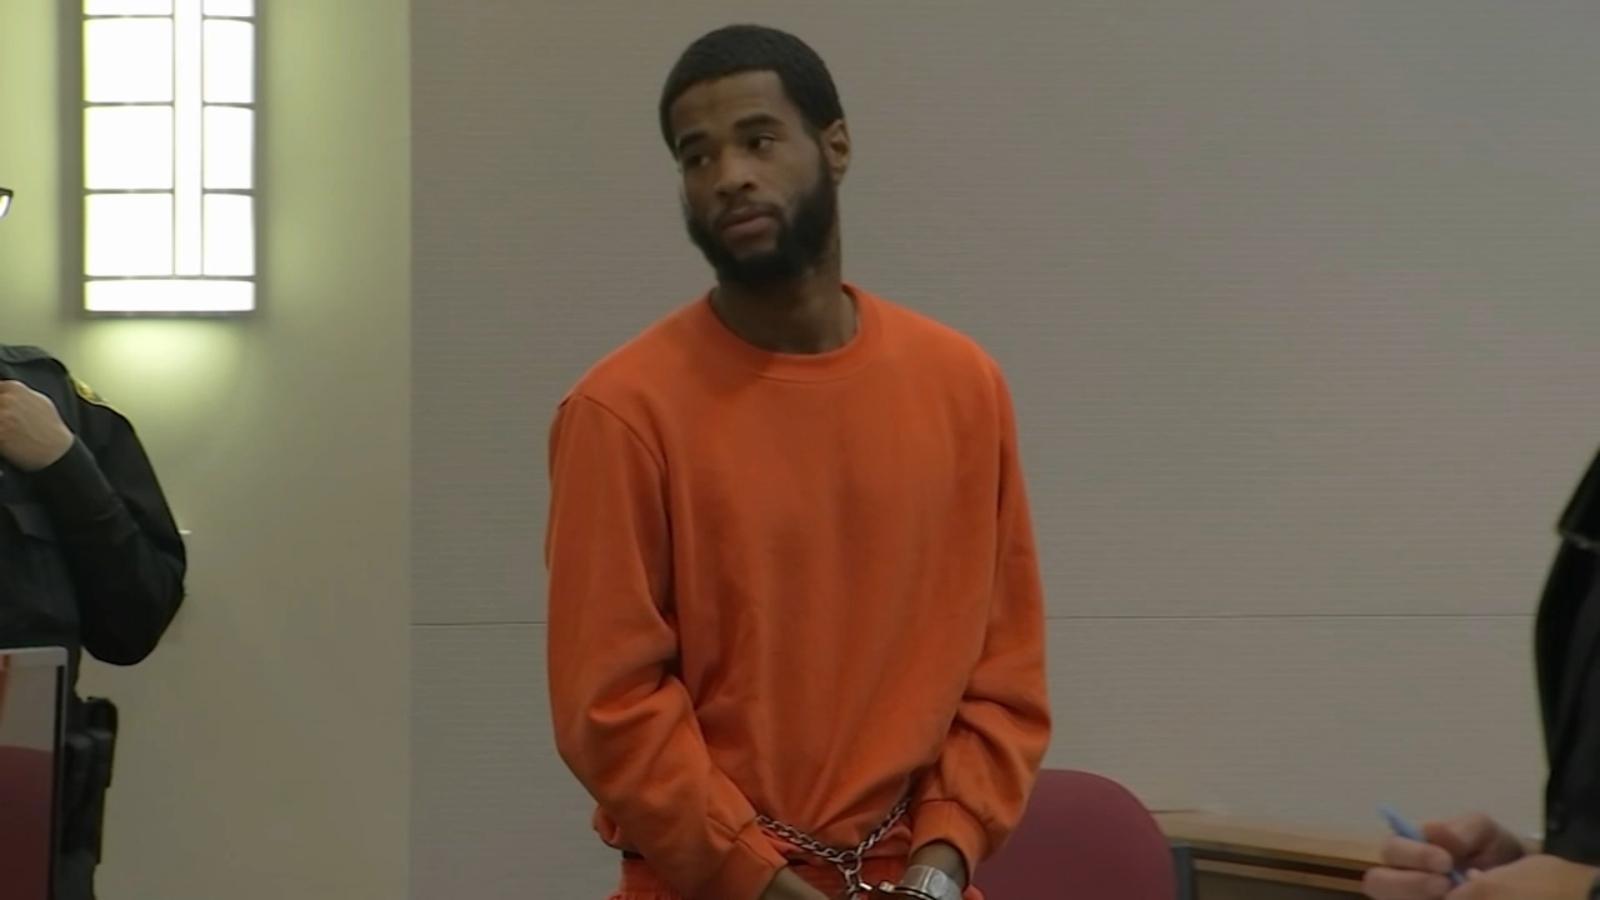 Man accused in NJ high school football game shooting pleads not guilty